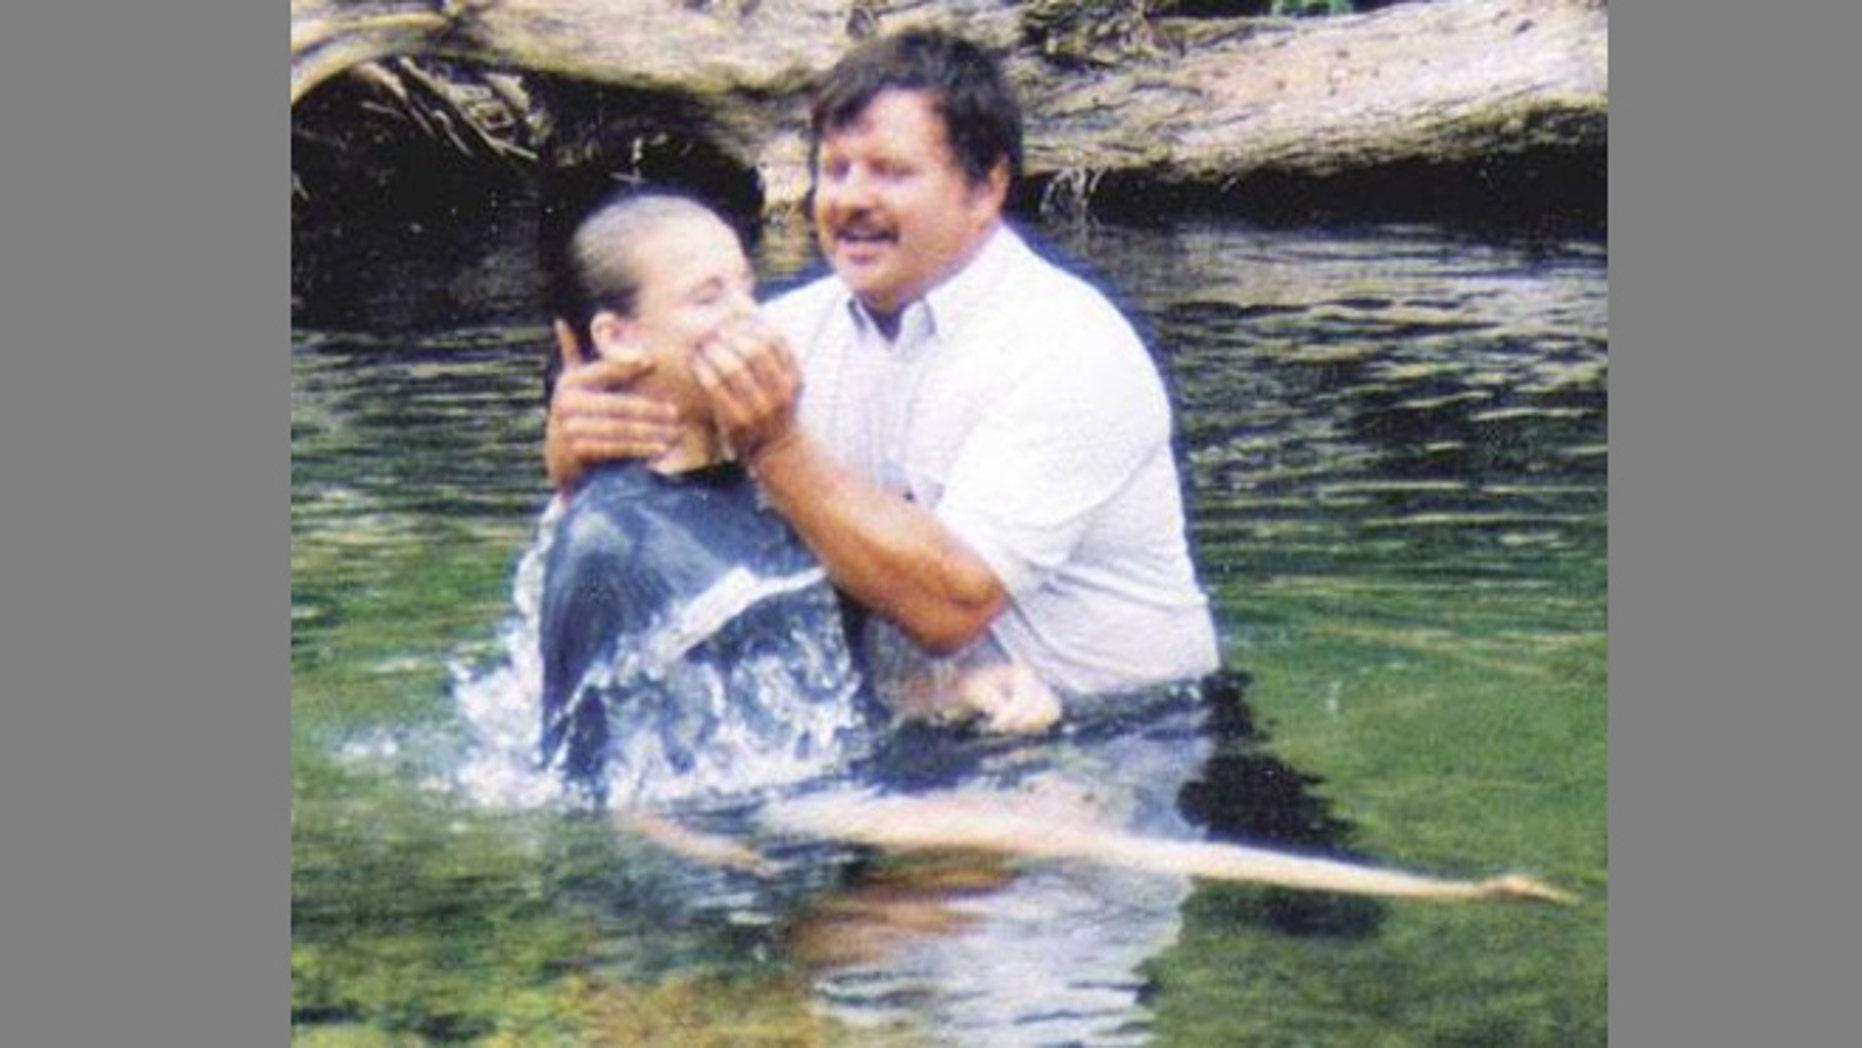 Pastor Jim Privett of Gladden Baptist Church performs a baptism in a Missouri creek.